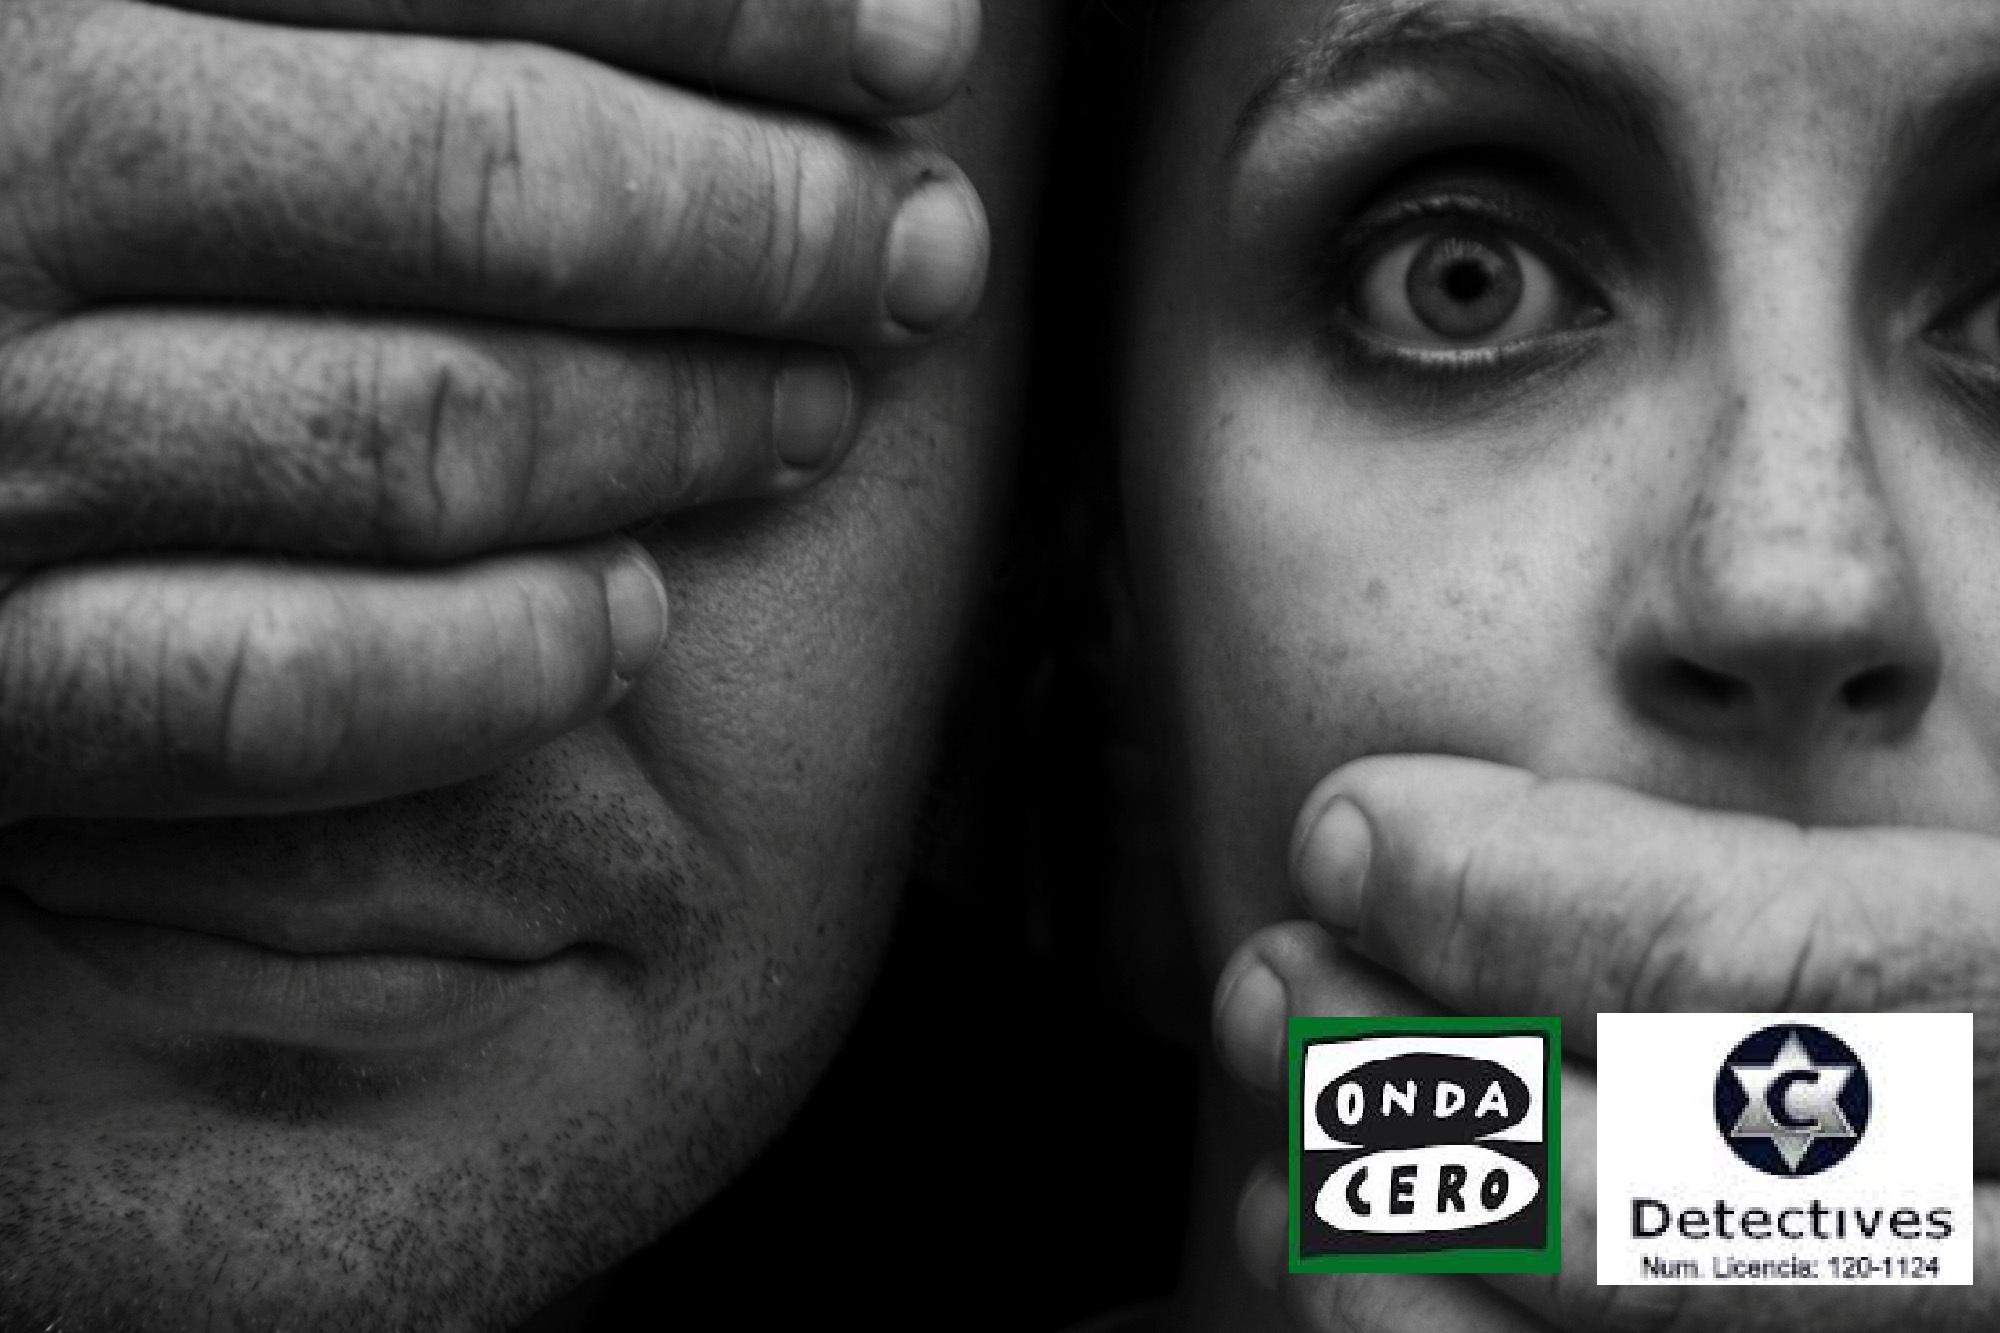 detectives para violencia de género